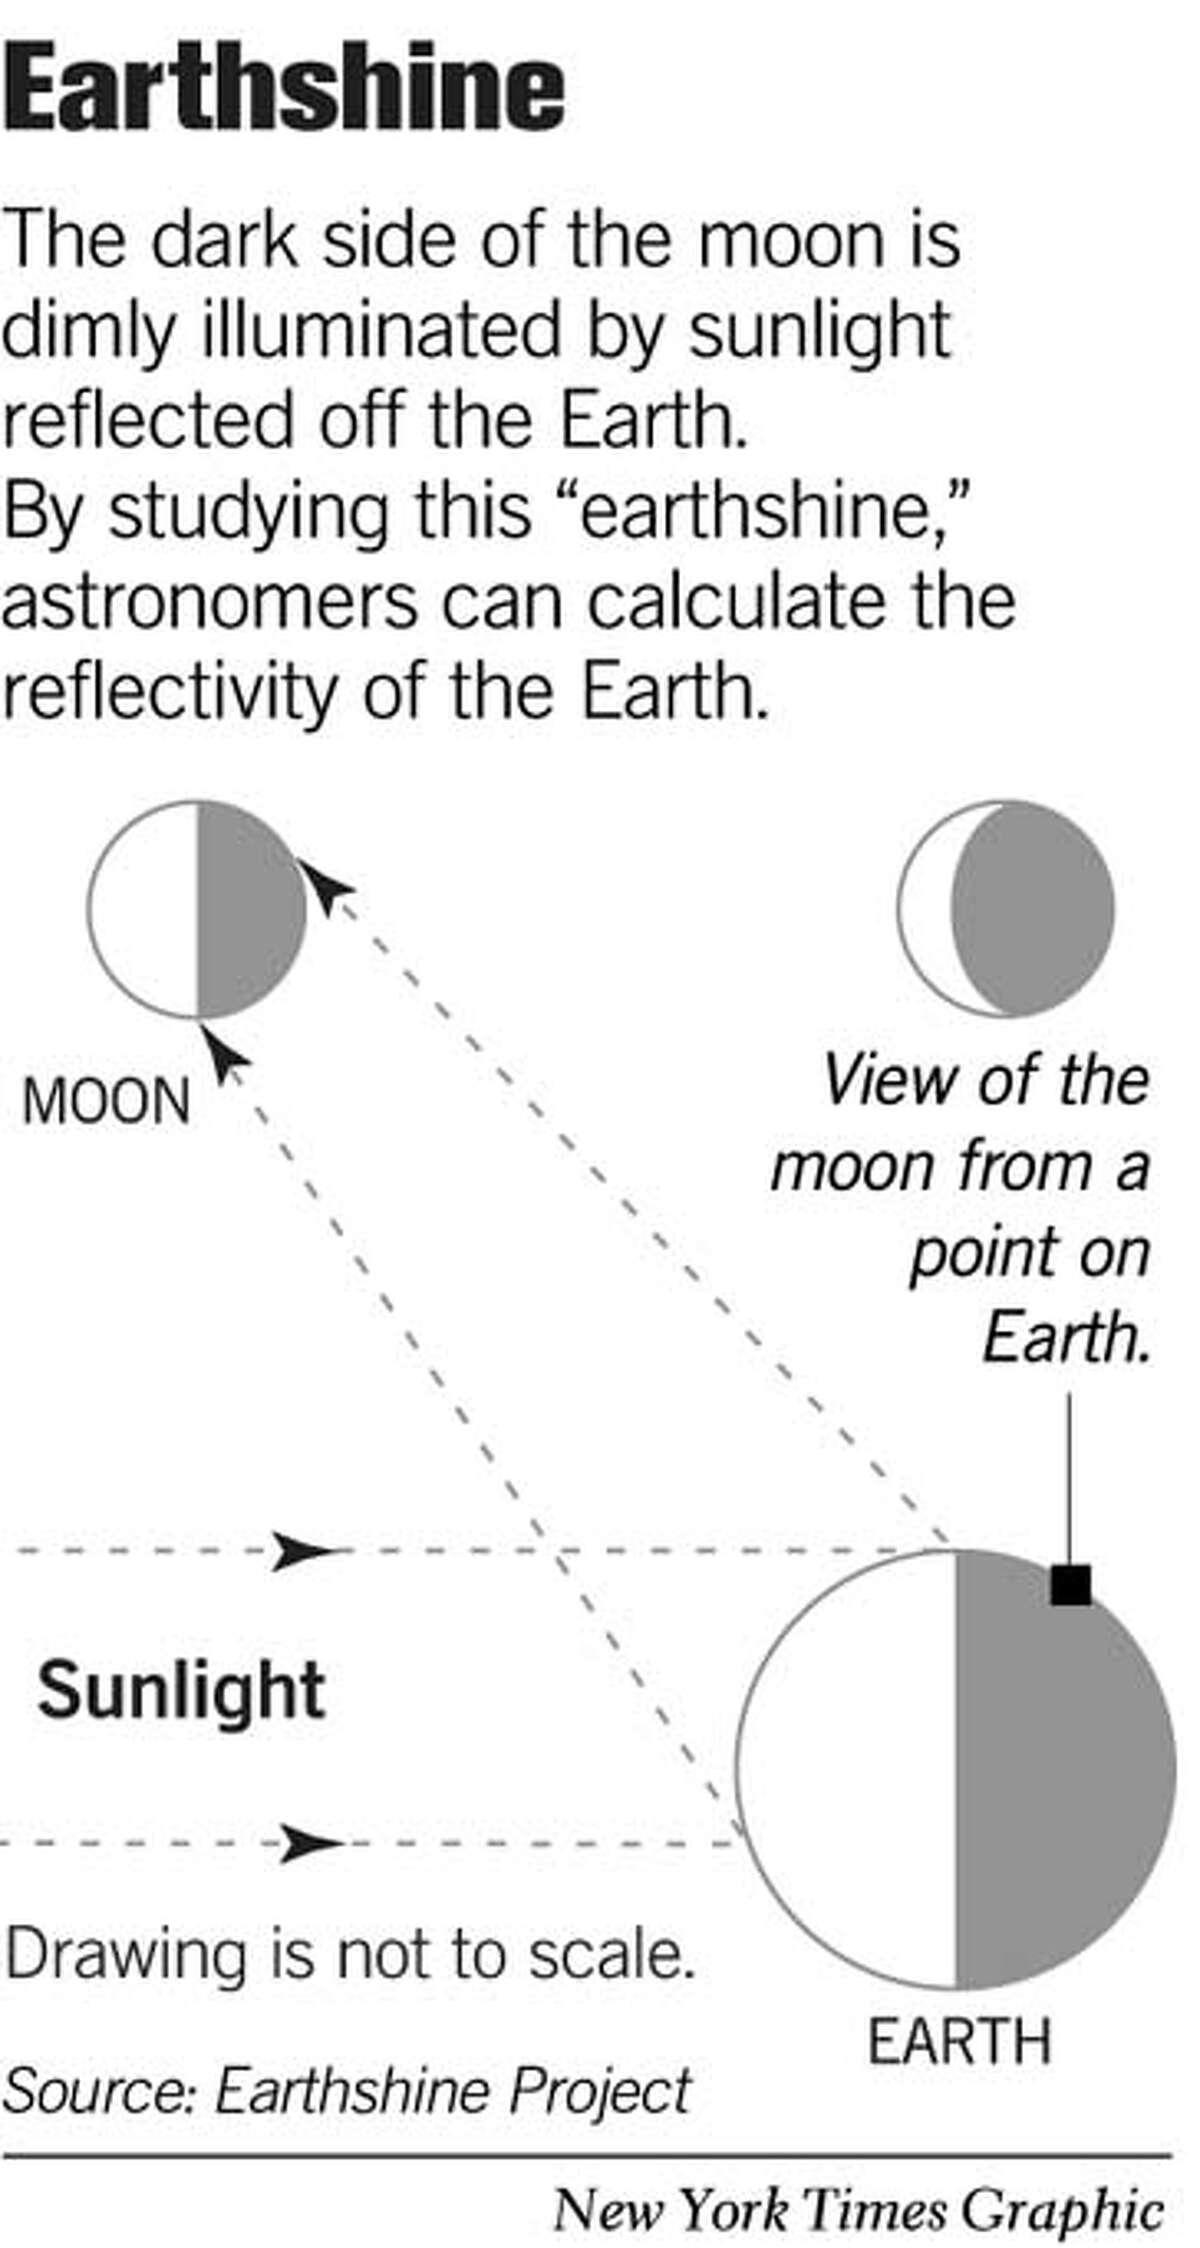 Earthshine. New York Times Graphic